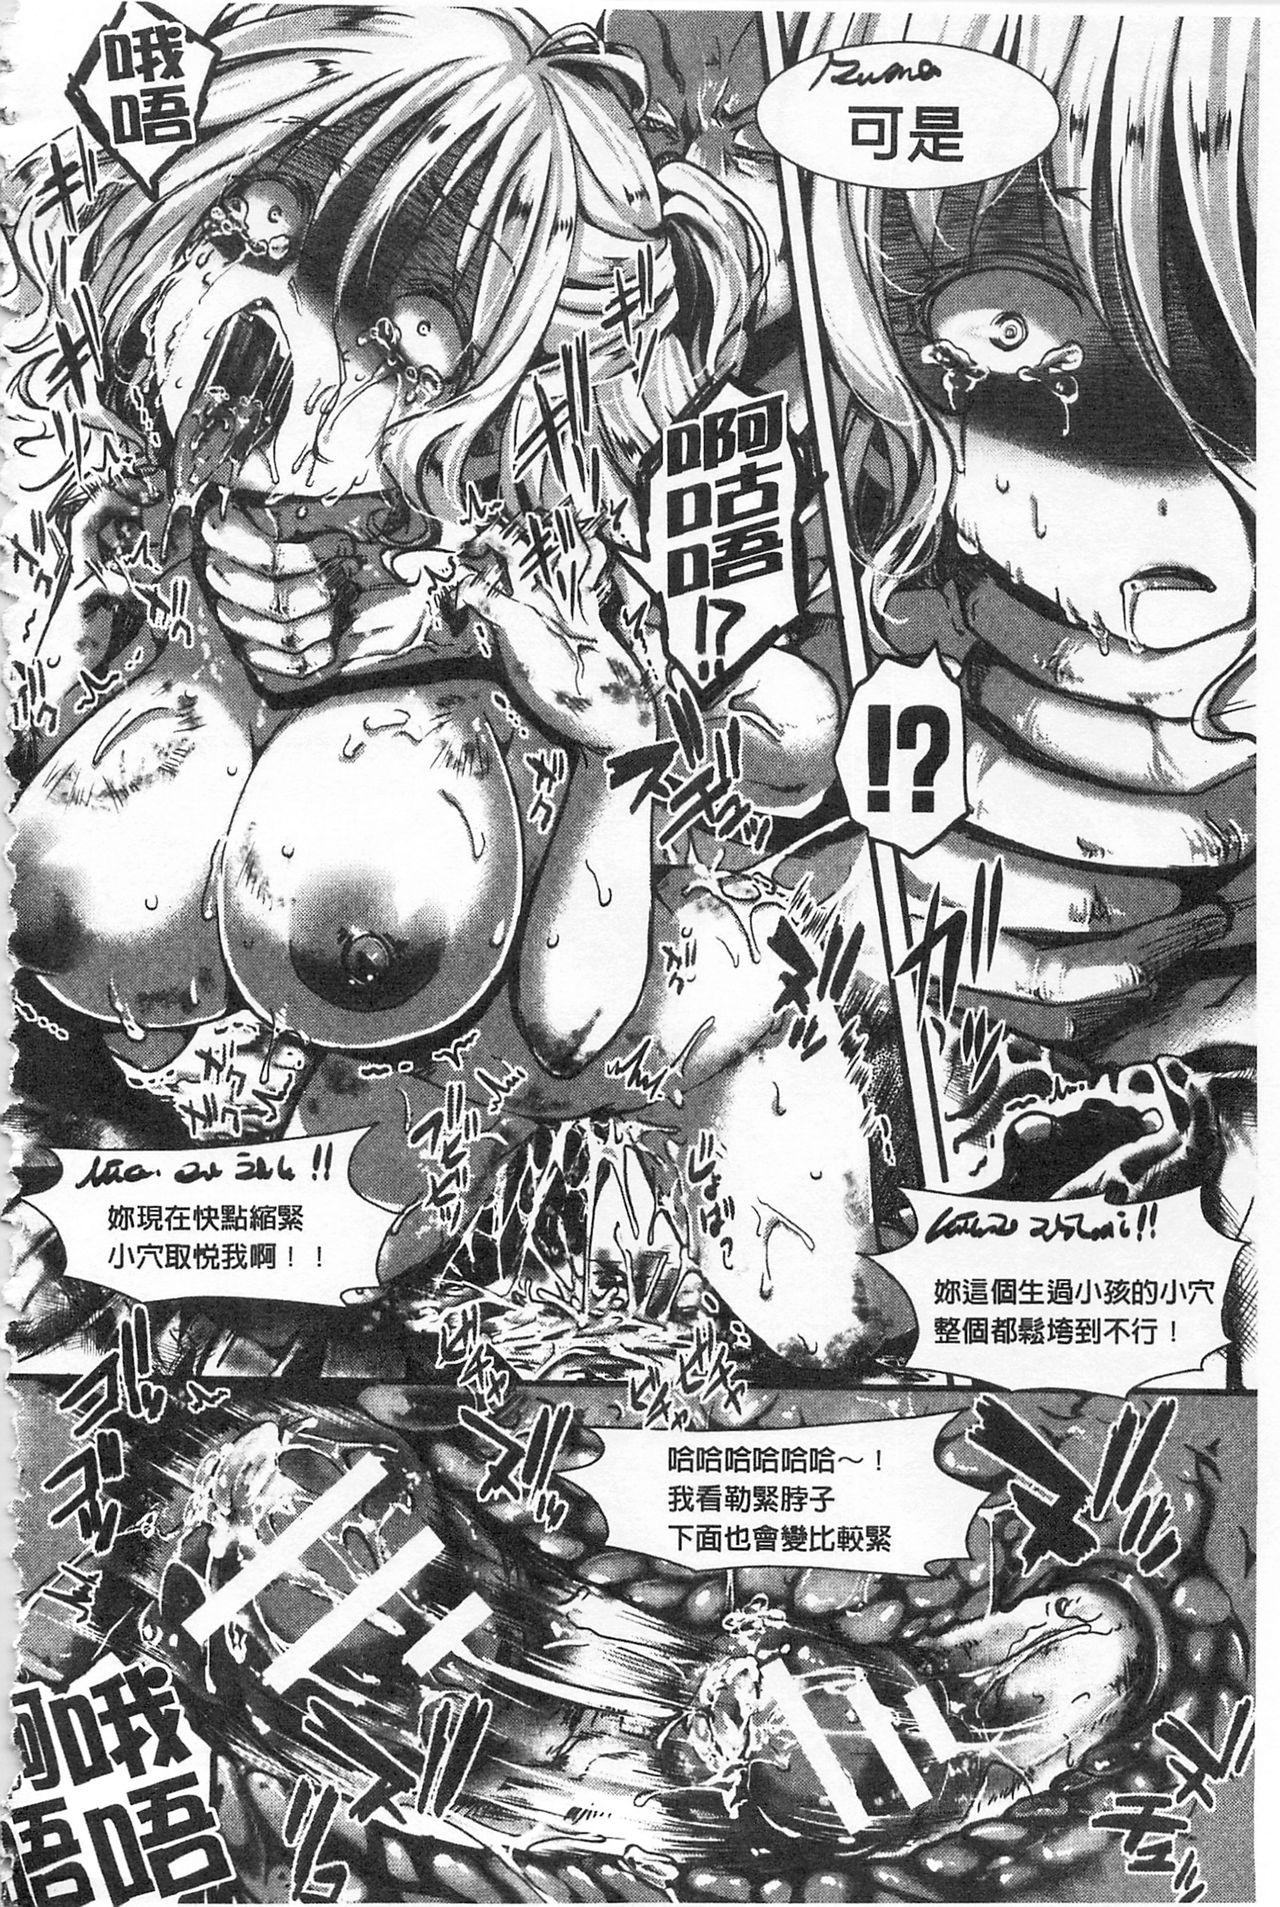 [hal] Daienjou -Ikare Ikasare Iki Ikare-   ∞艶嬢 -洩出來被搞到洩掛了被搞掛-  [Chinese] 109